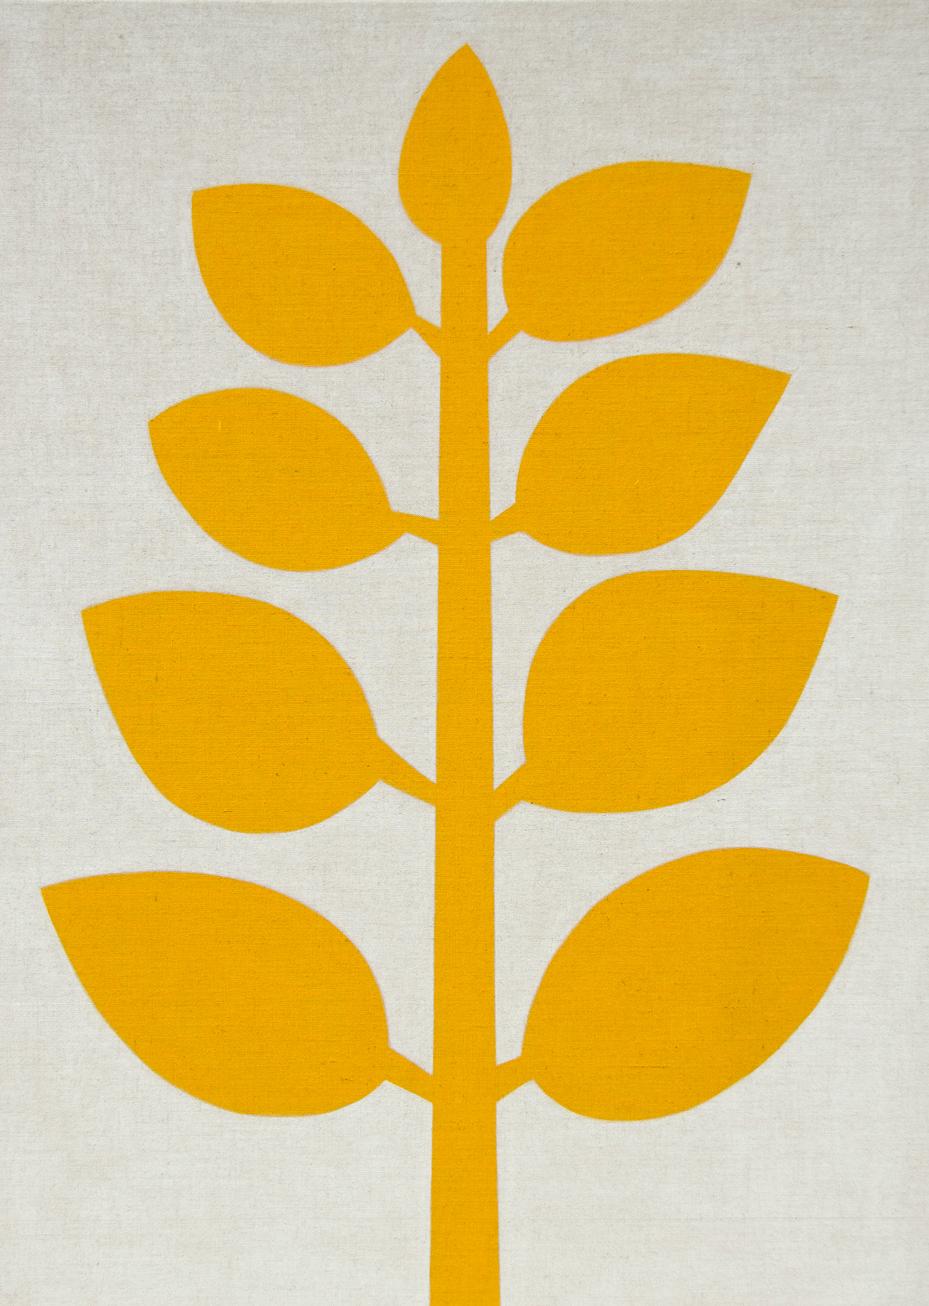 Yellow Plant (Light) #1 , 2017 acrylic on jute 78-3/4 x 57 inches, 200 x 145 cm ABM098